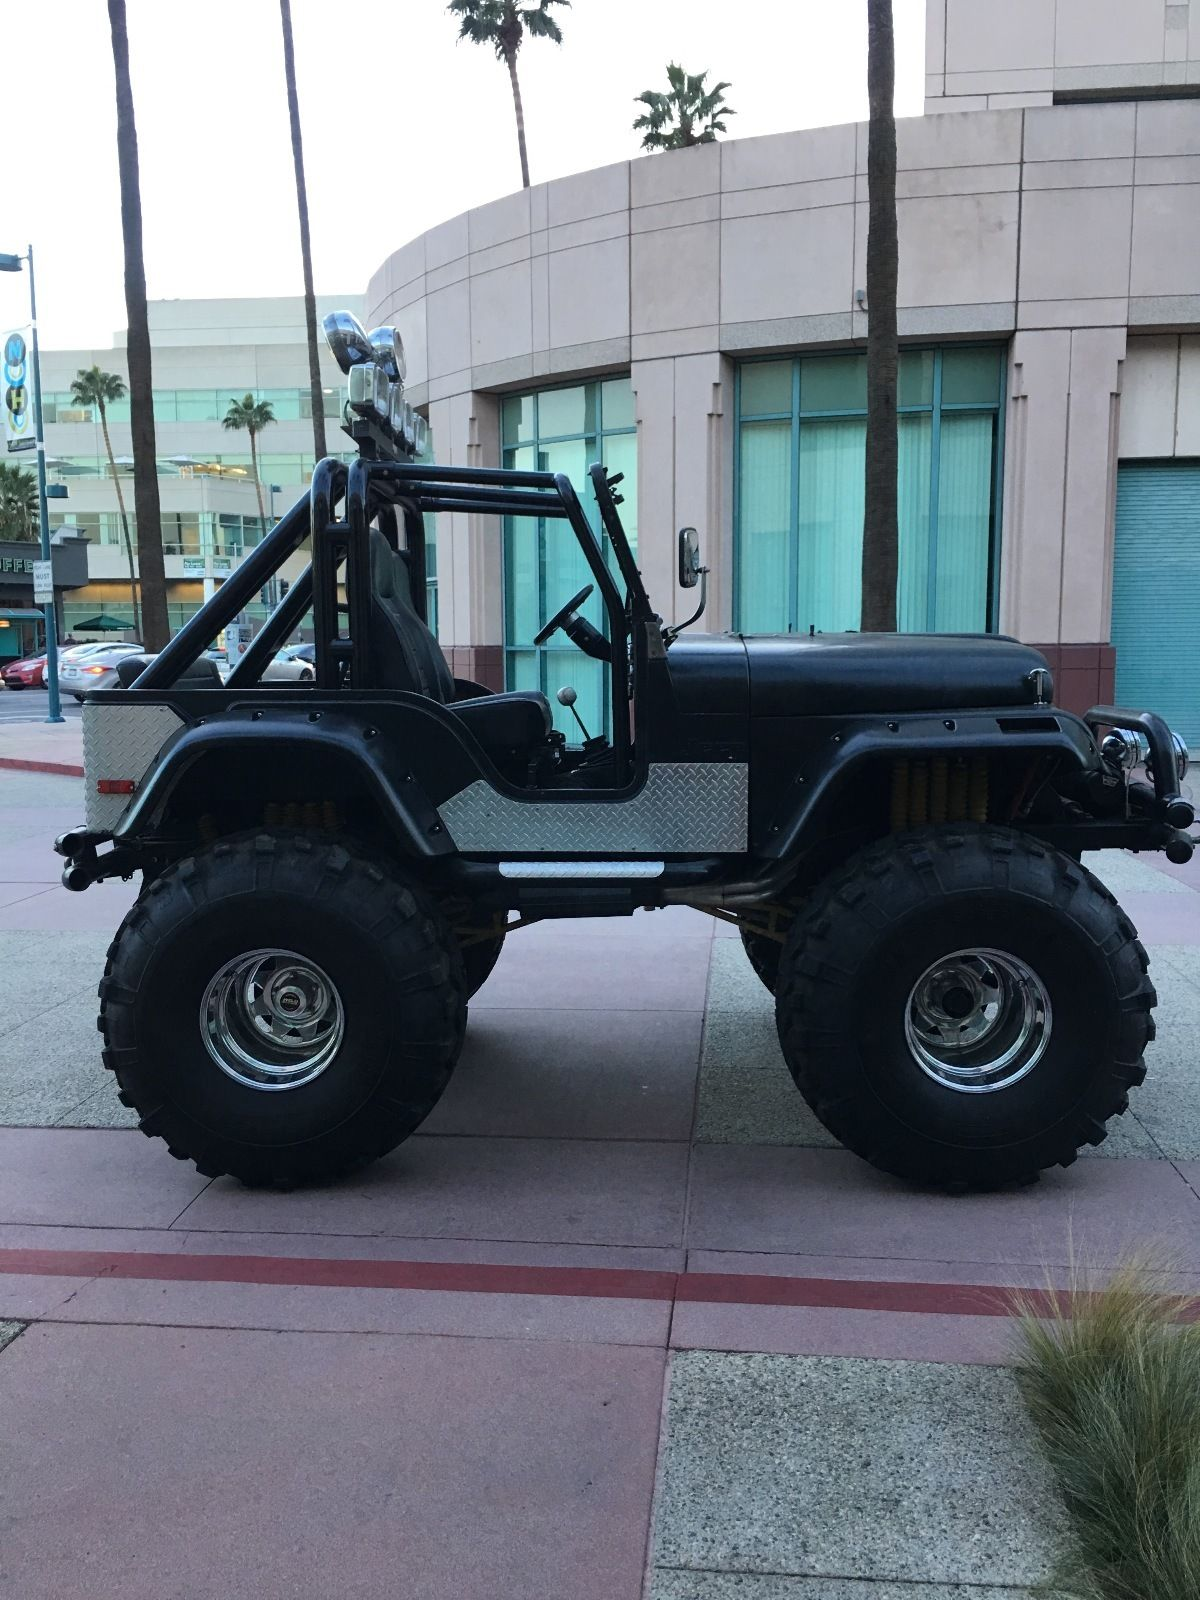 73 Cj 5 High Lift Monster Amc V8 Swamper Tires Jeepfan Com